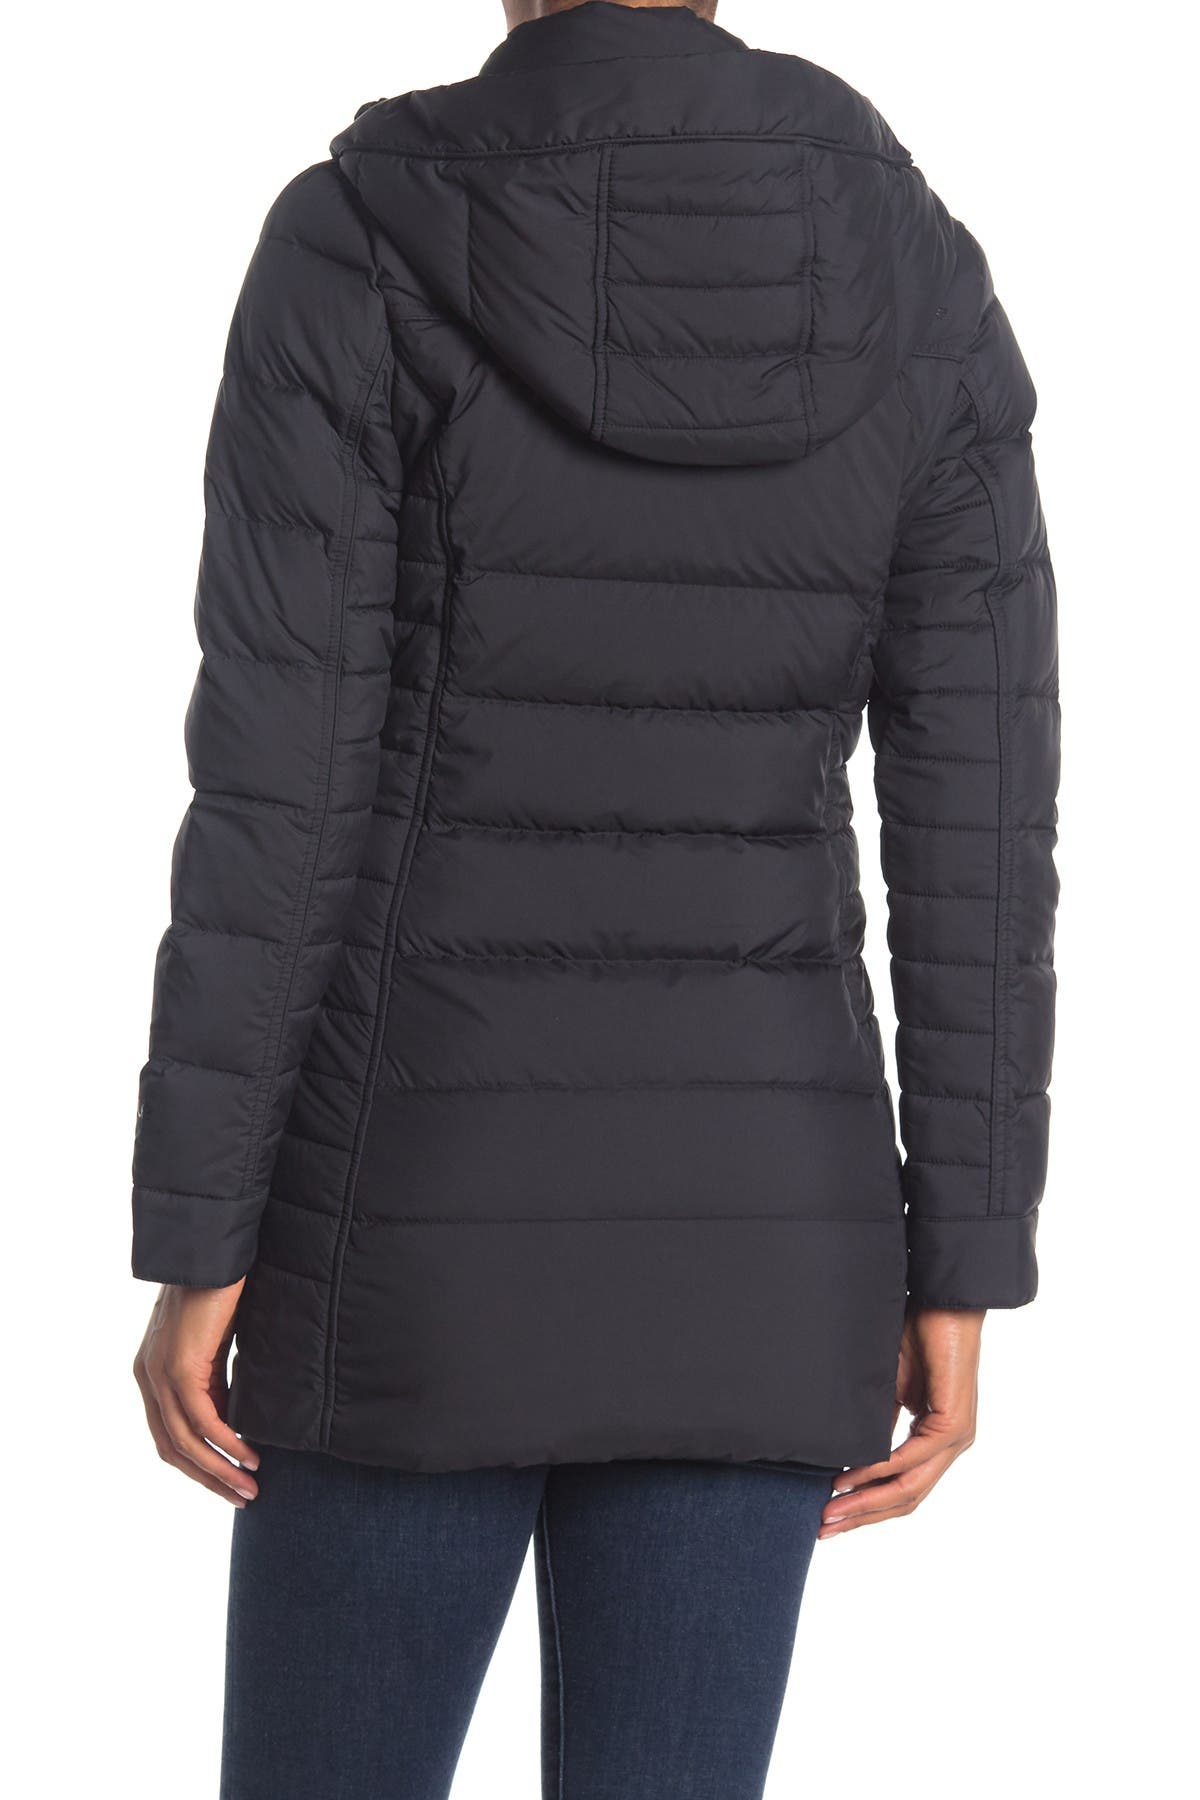 Image of Lole Gisele Hooded Down Puffer Jacket